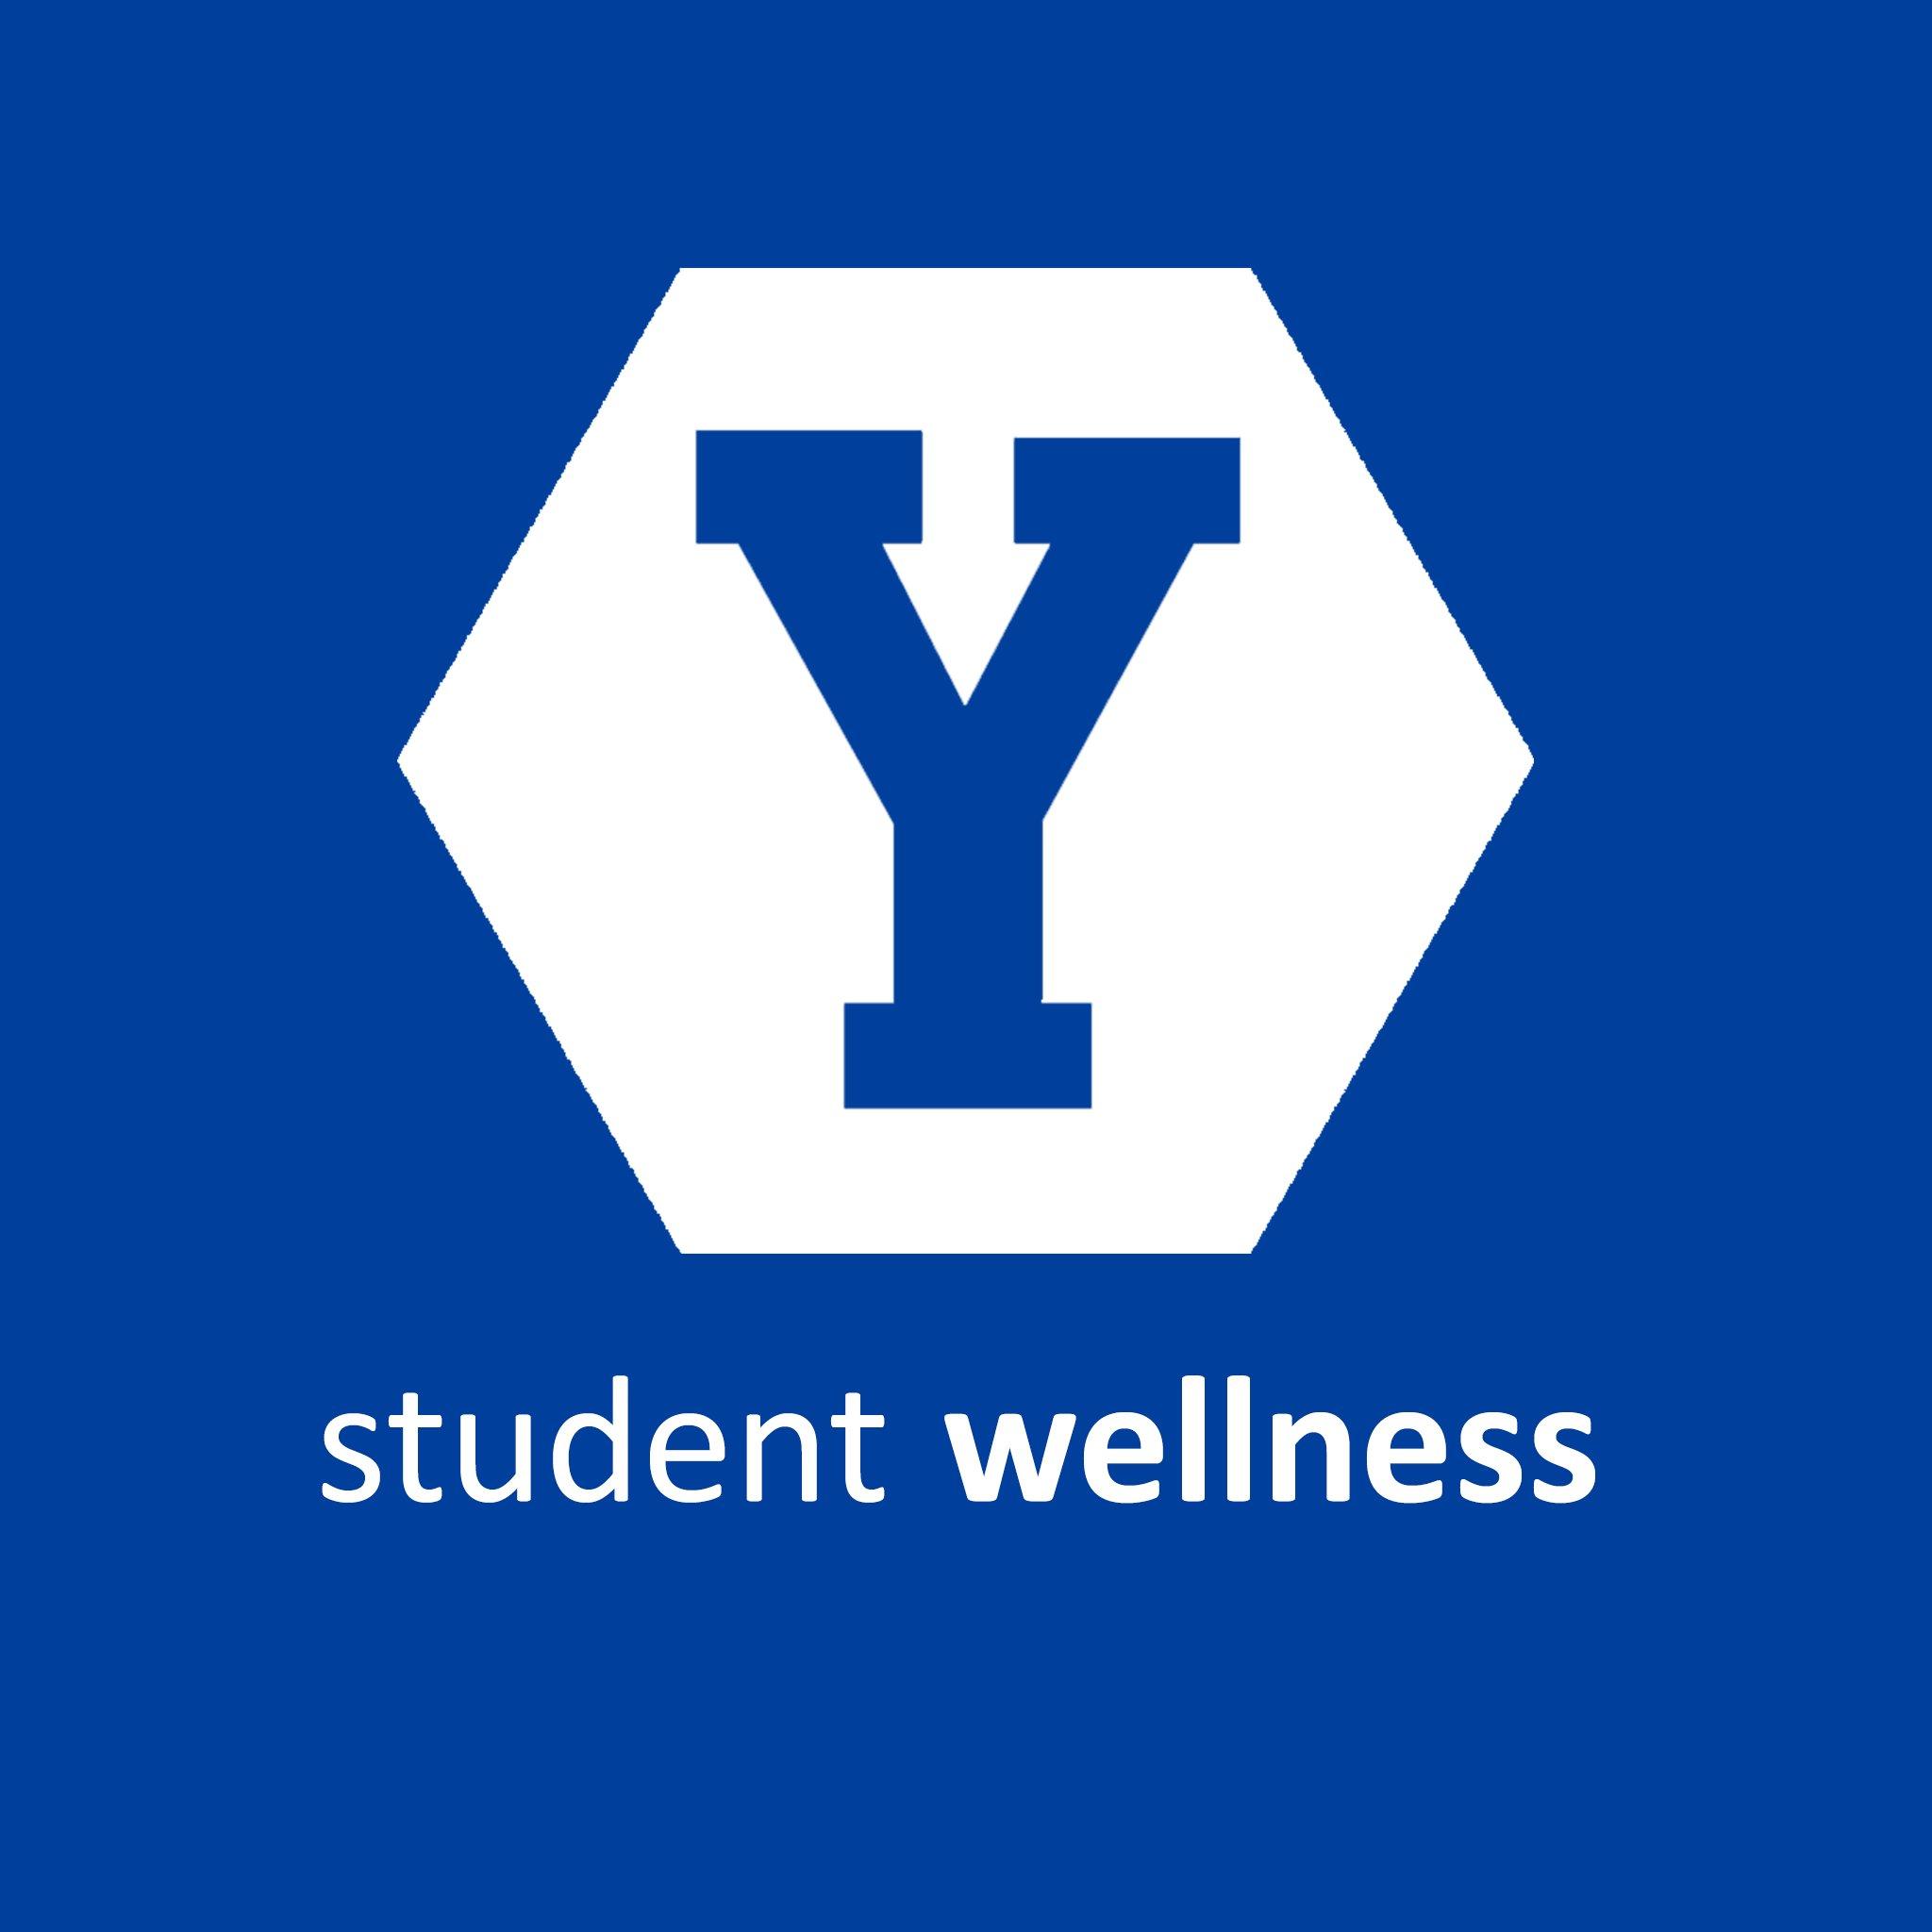 Byu Student Wellness